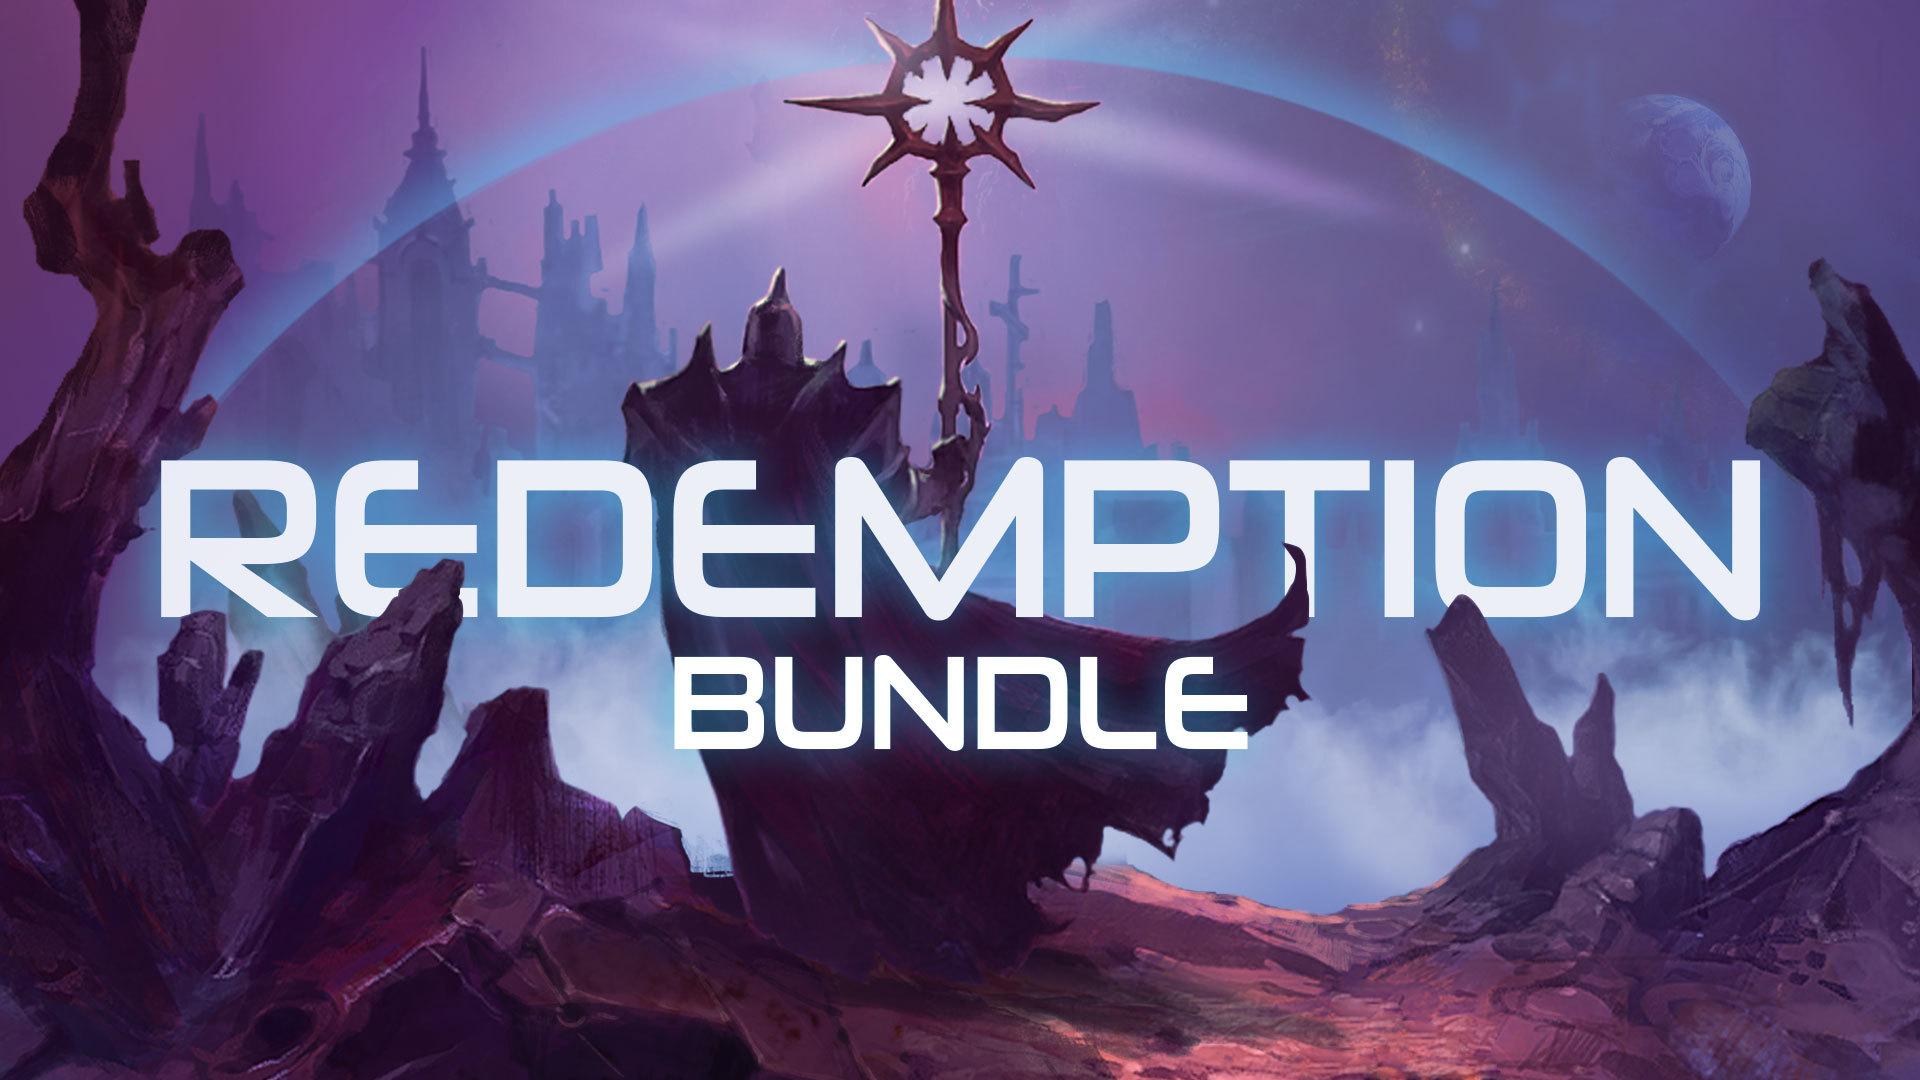 Redemption Bundle | Steam Game Bundle | Fanatical